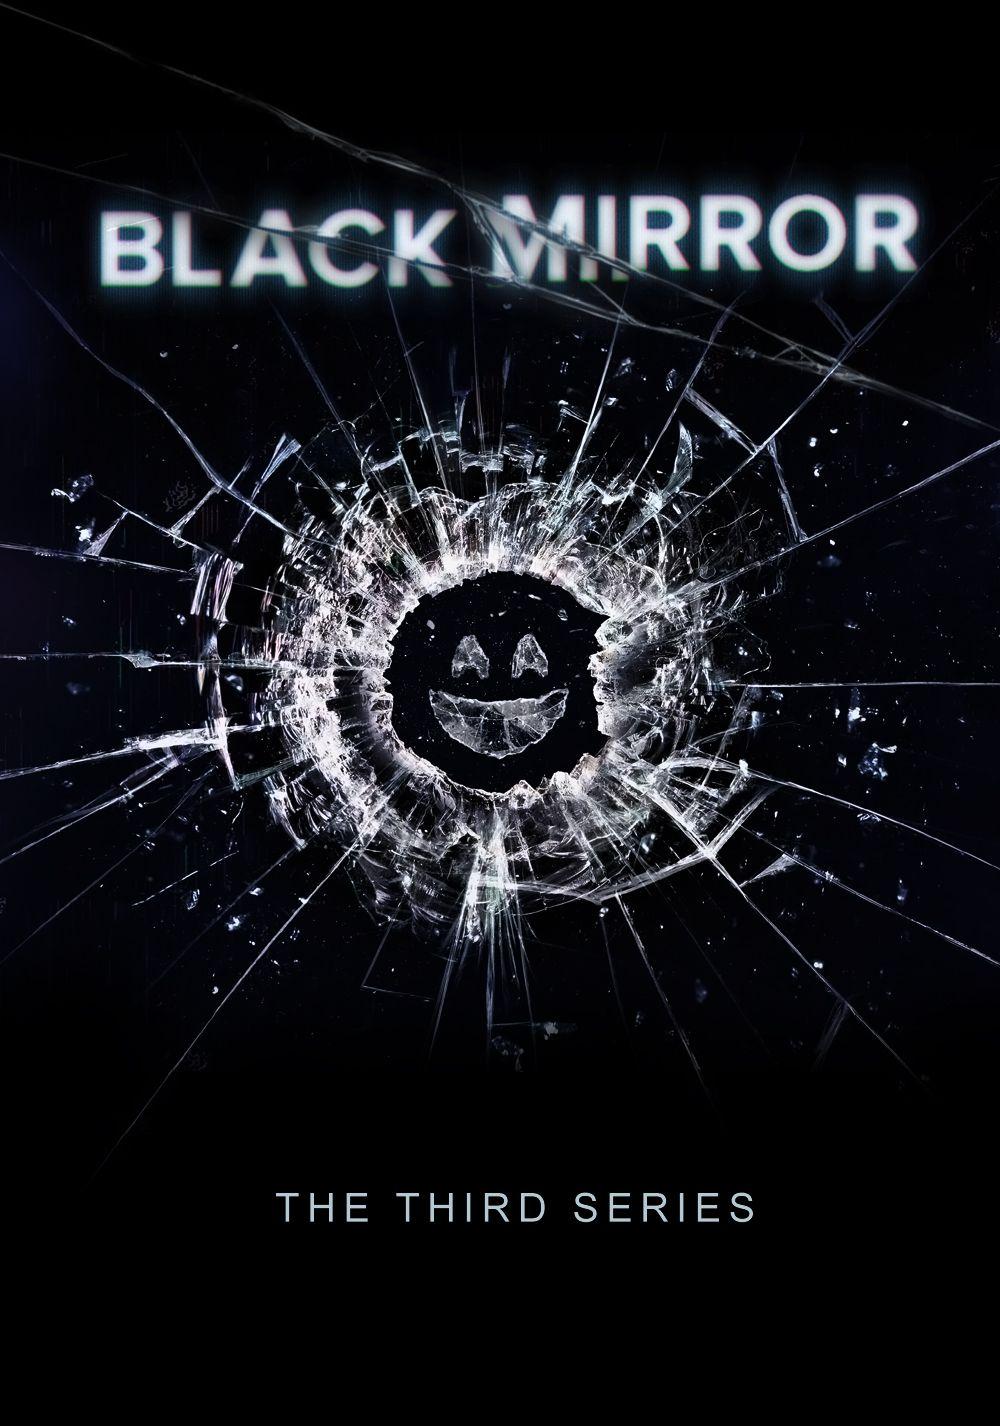 Black Mirror (2016) Season 3, 6 Episodes 1h Drama, Sci